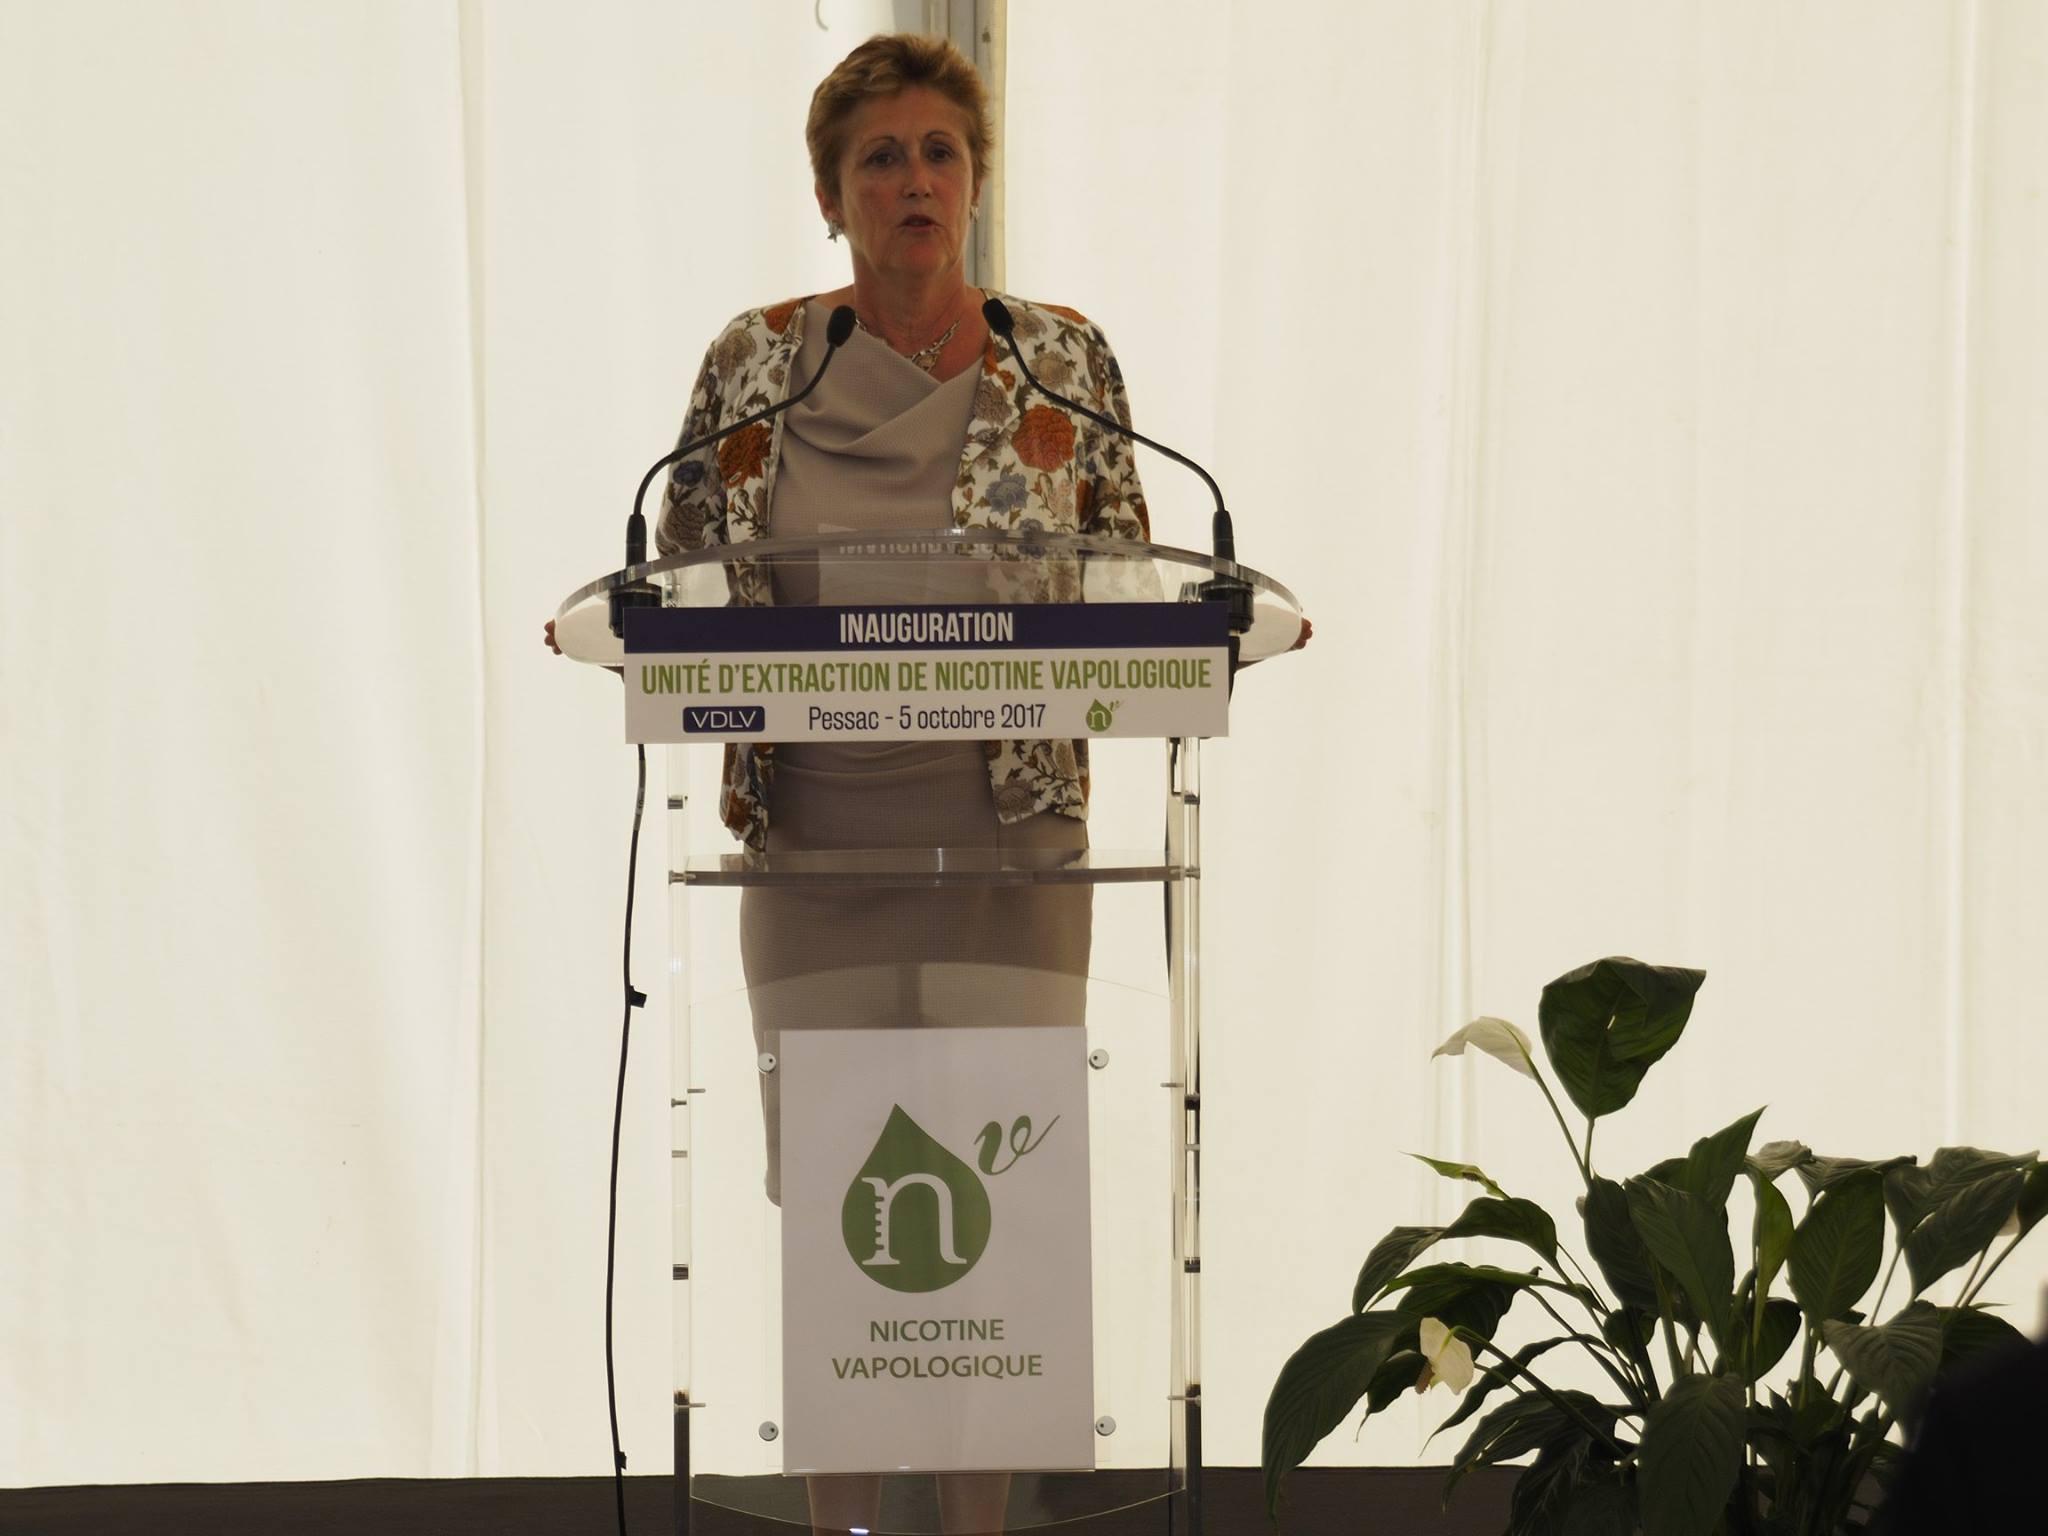 Discours de Sylvie Trautmann, Adjointe au maire de Pessac